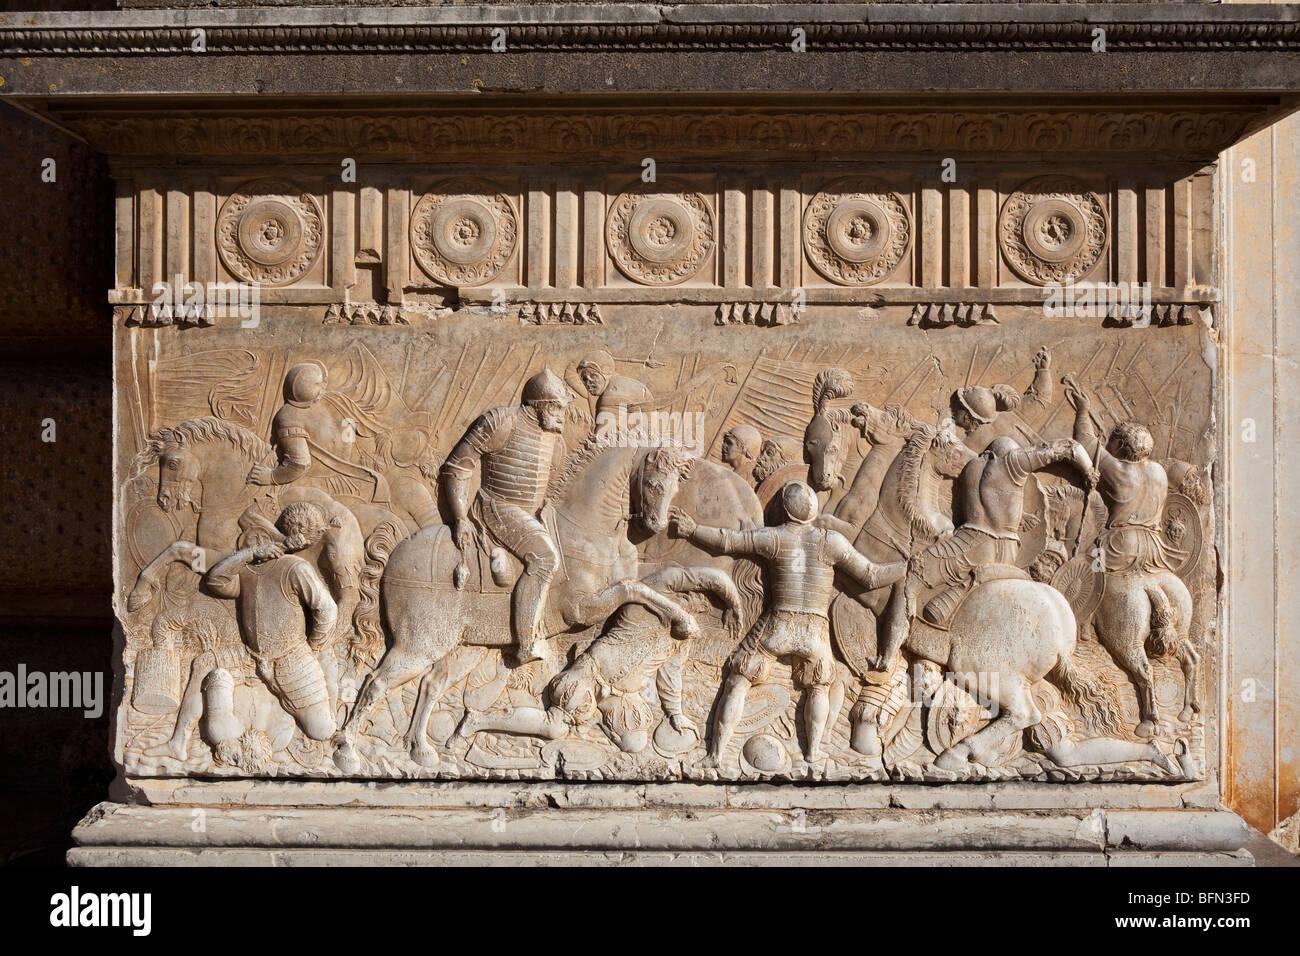 bas relief of battle scene beside west doorway, Palace of Charles V, Alhambra, Granada, Spain - Stock Image